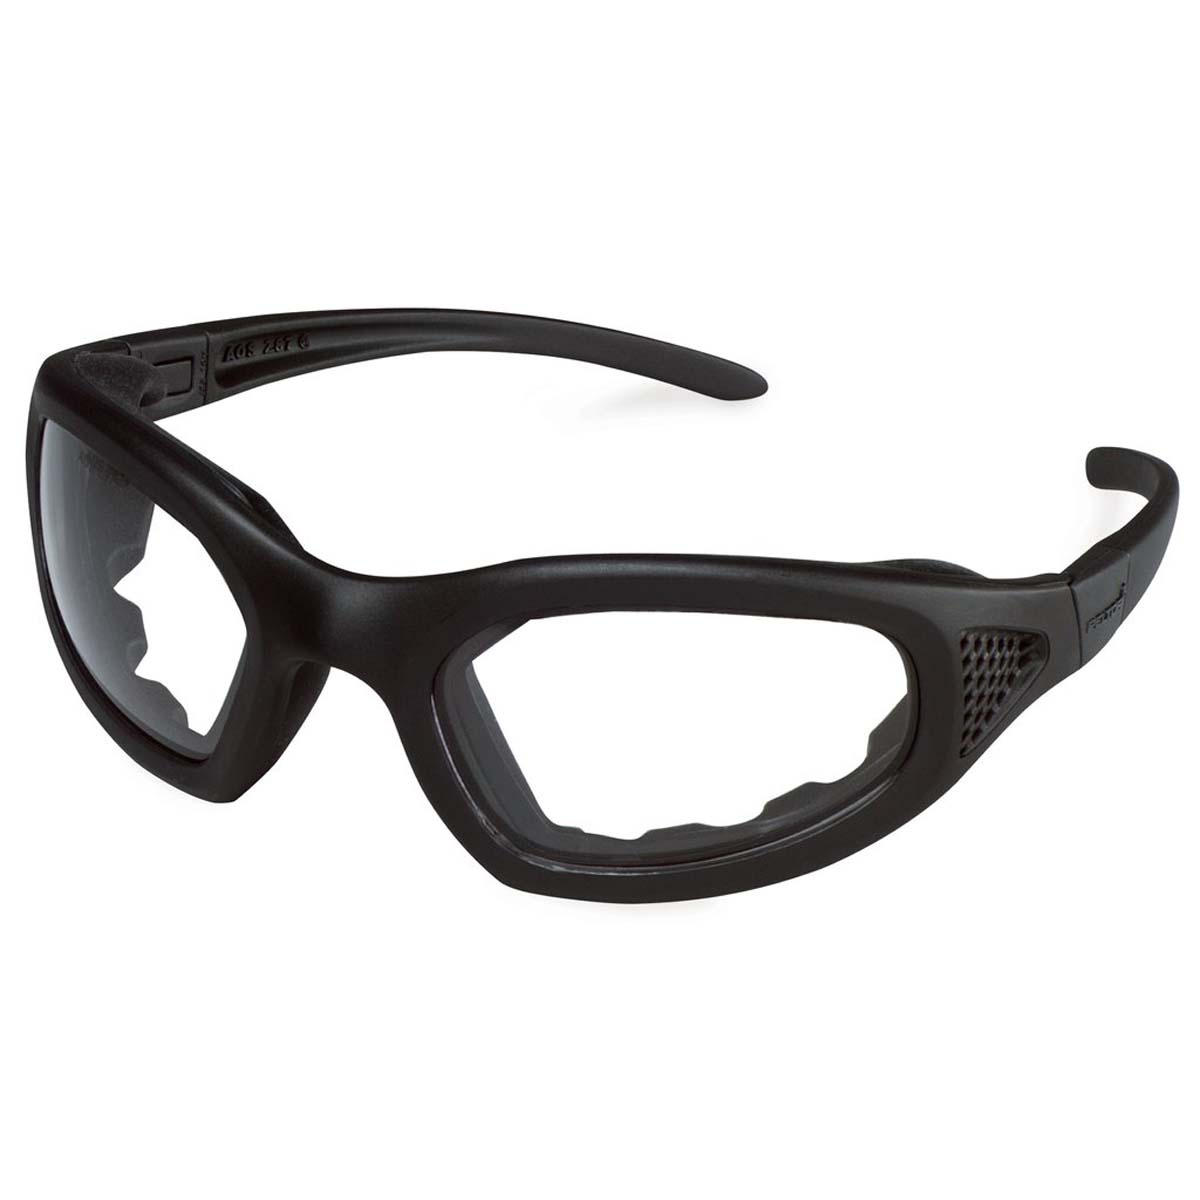 "3Mâ""¢ Maximâ""¢ 2x2 Safety Goggles 40696-00000 Clear Anti-Fog Lens, Black Frame, Strap, Side Venting"